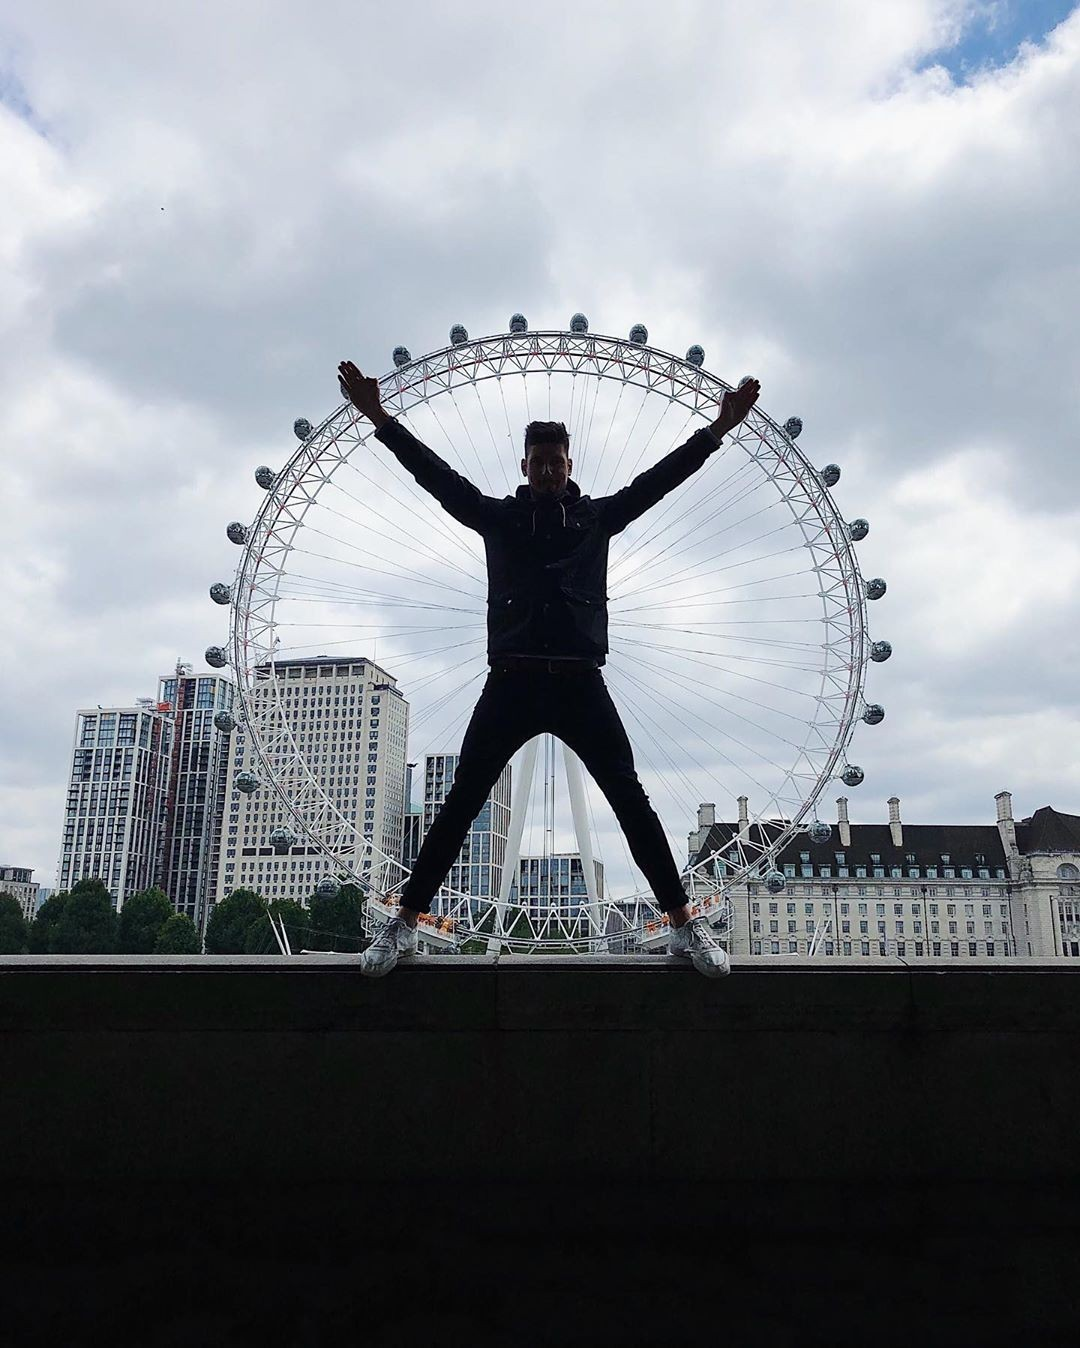 «Витрувианский человек». Лондонский глаз (колесо обозрения), Лондон. Автор Тиаго Силва